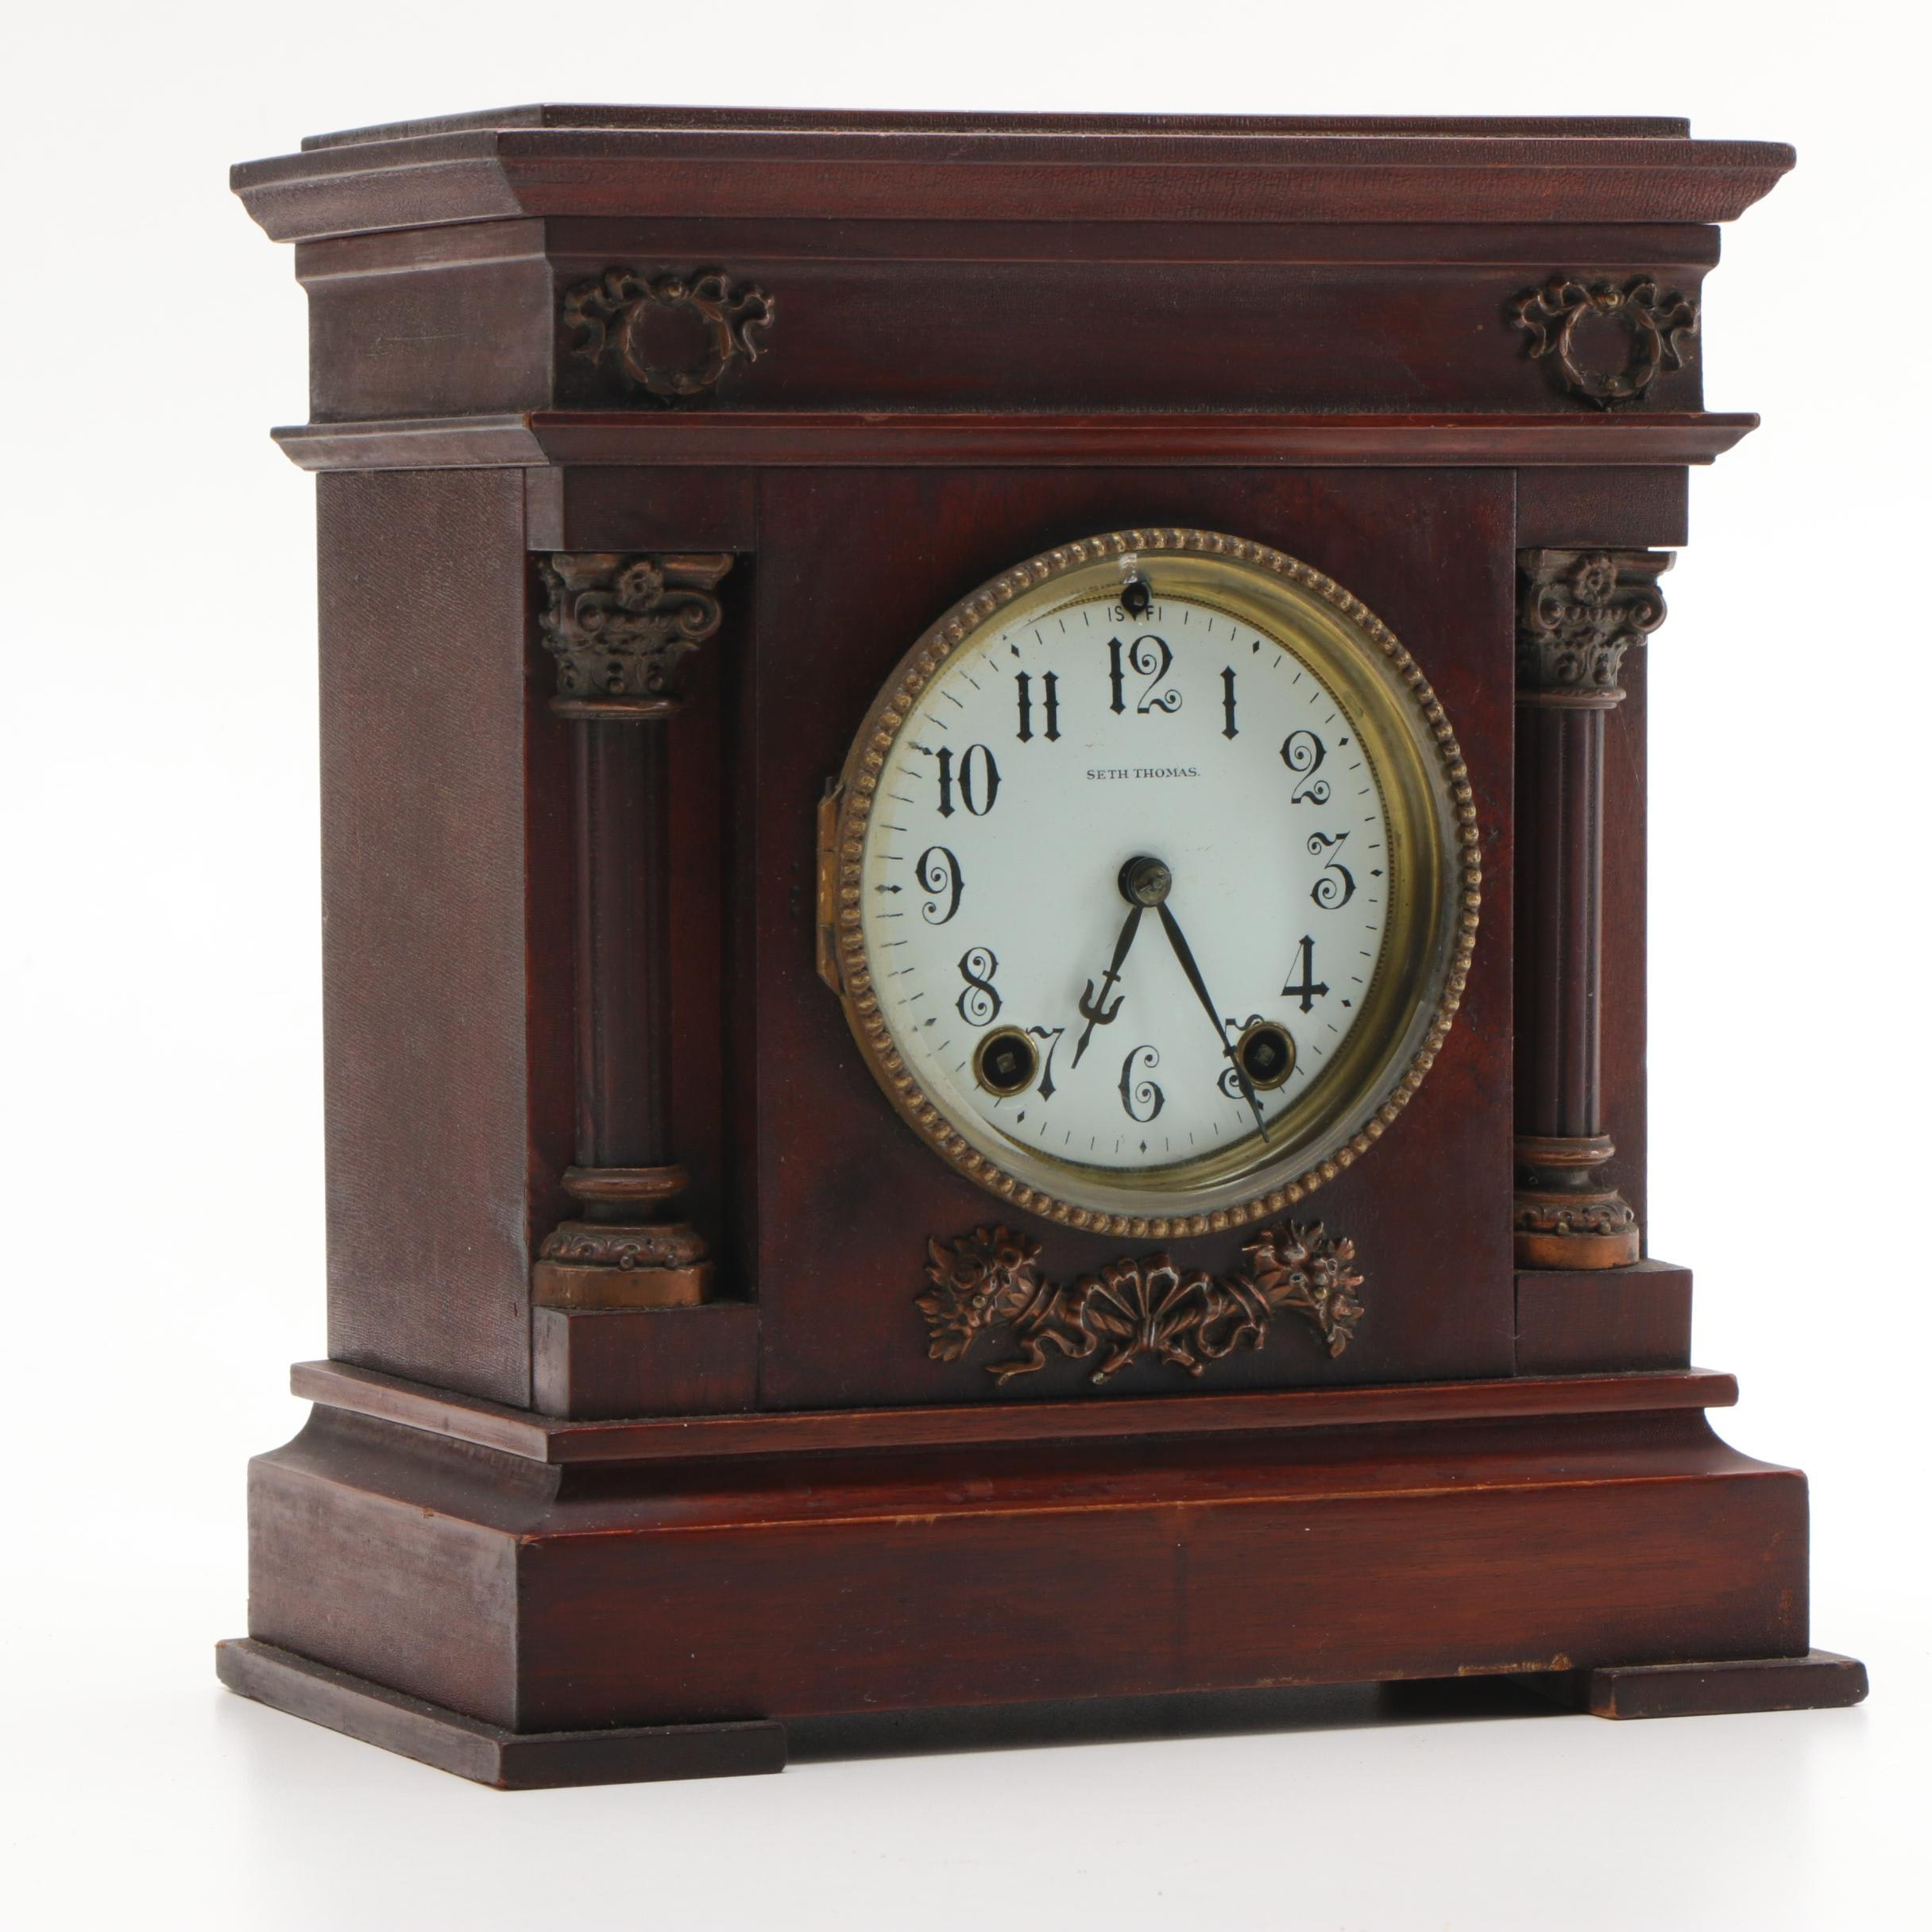 Seth Thomas analog mantle clock